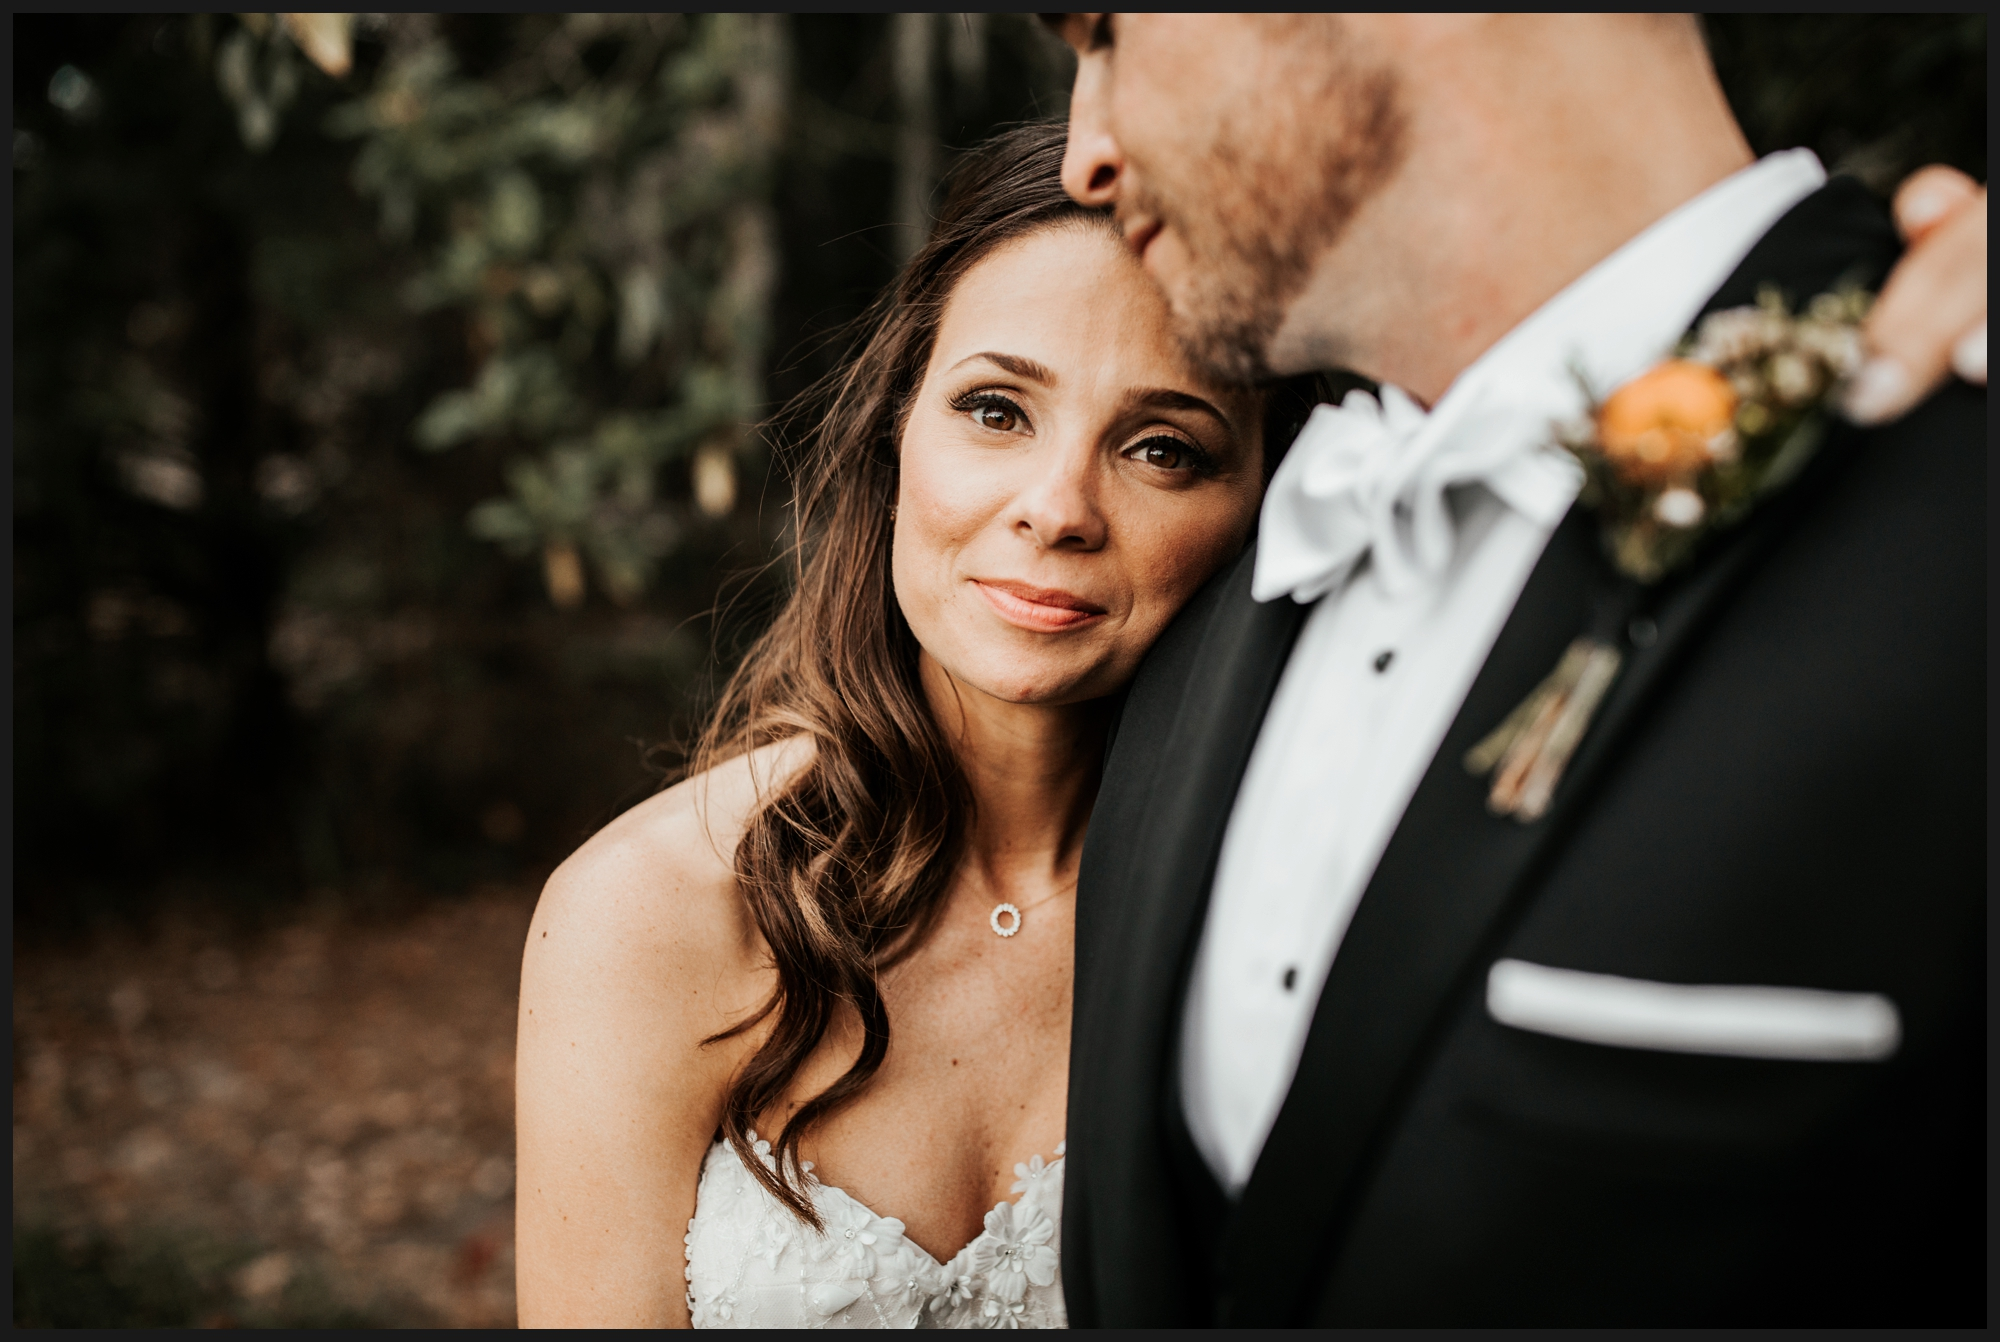 Orlando-Wedding-Photographer-destination-wedding-photographer-florida-wedding-photographer-hawaii-wedding-photographer_0241.jpg